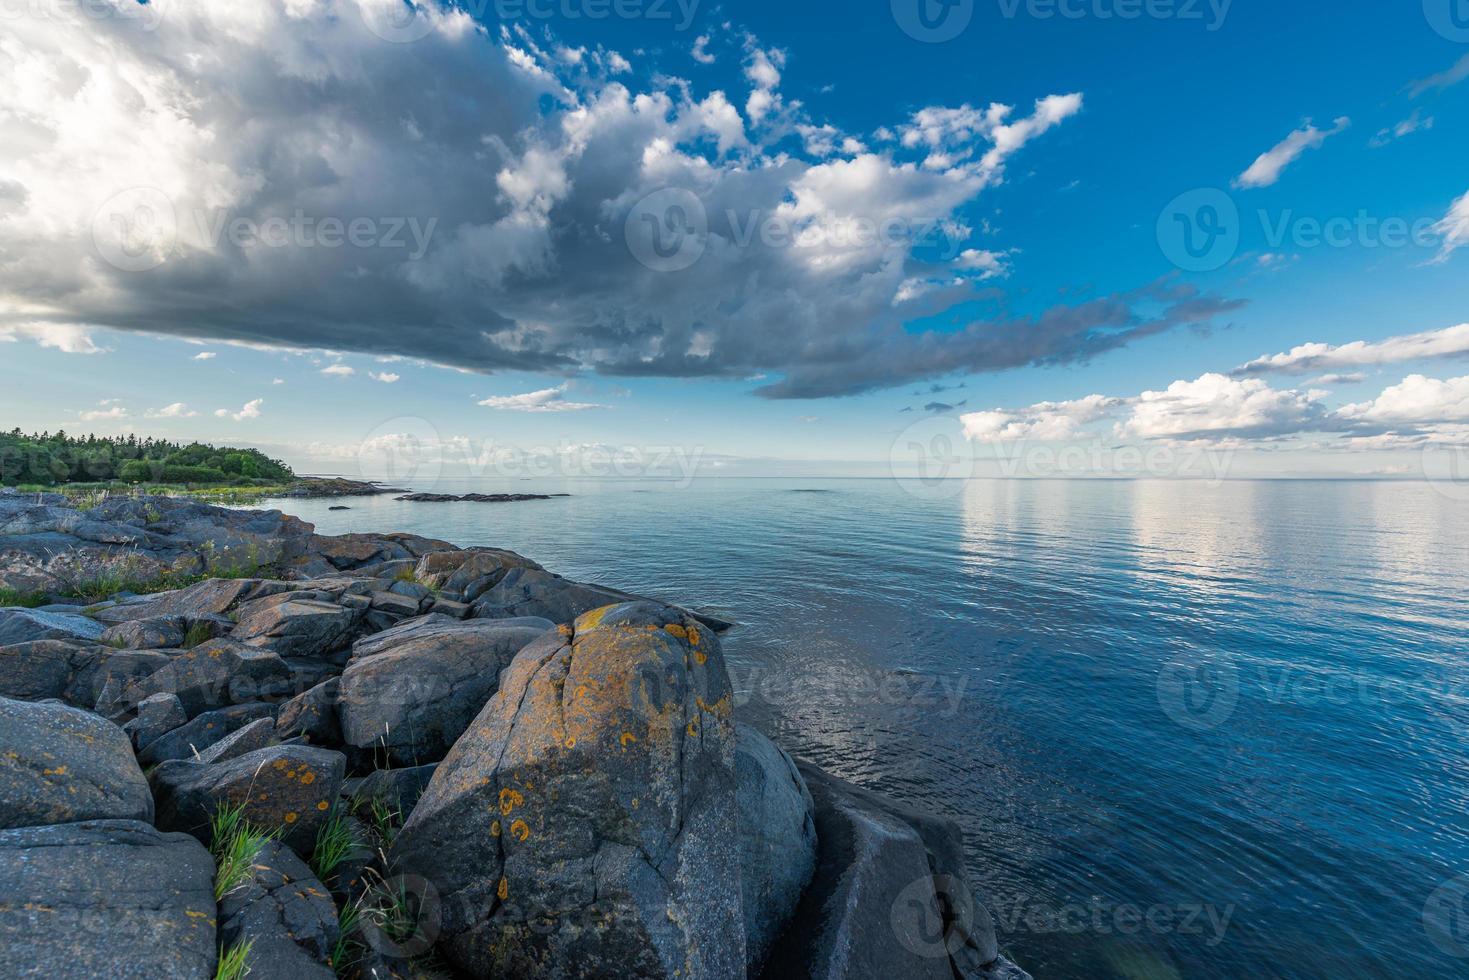 Archipelago of Sweden photo